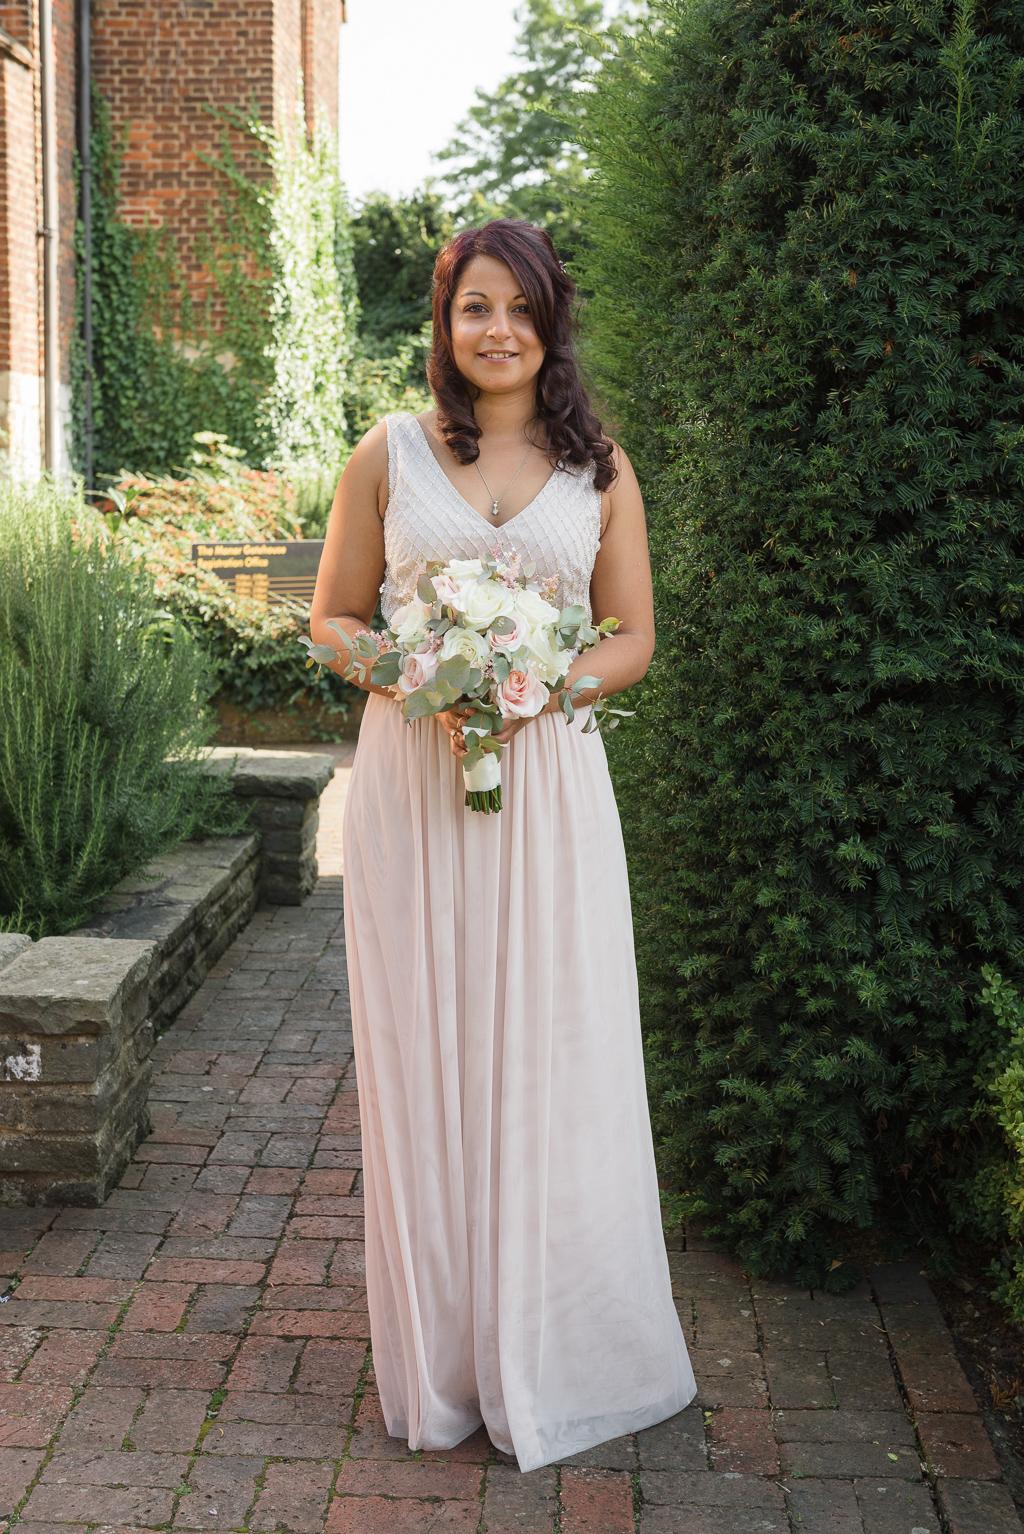 Bride Portrait atThe Manor Gatehouse Dartford | Kent Wedding Photographers | Oakhouse Photography